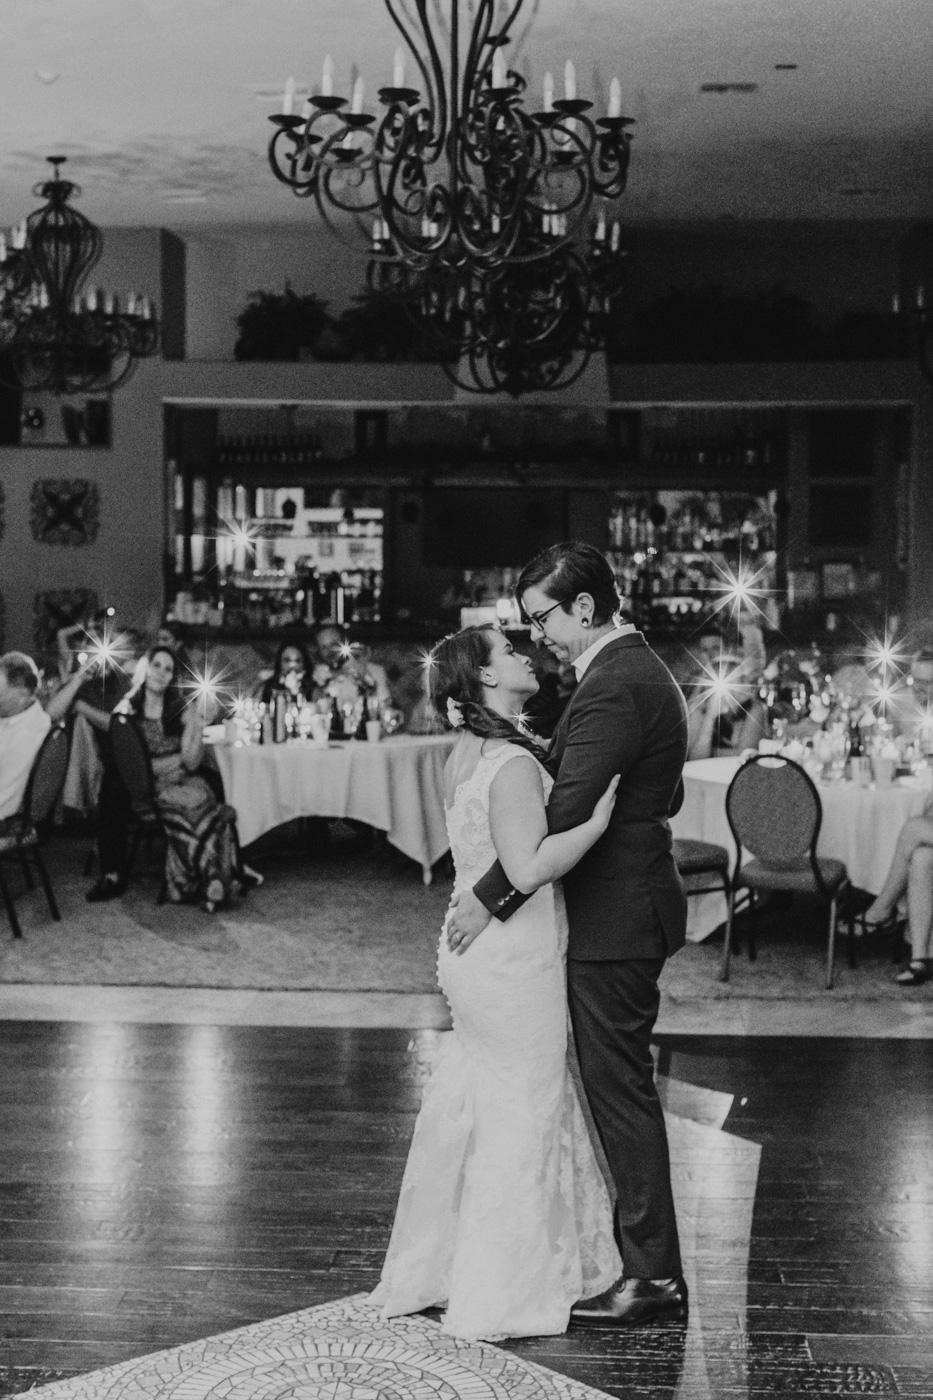 northern-arizona-wedding-first-dance-black-and-white